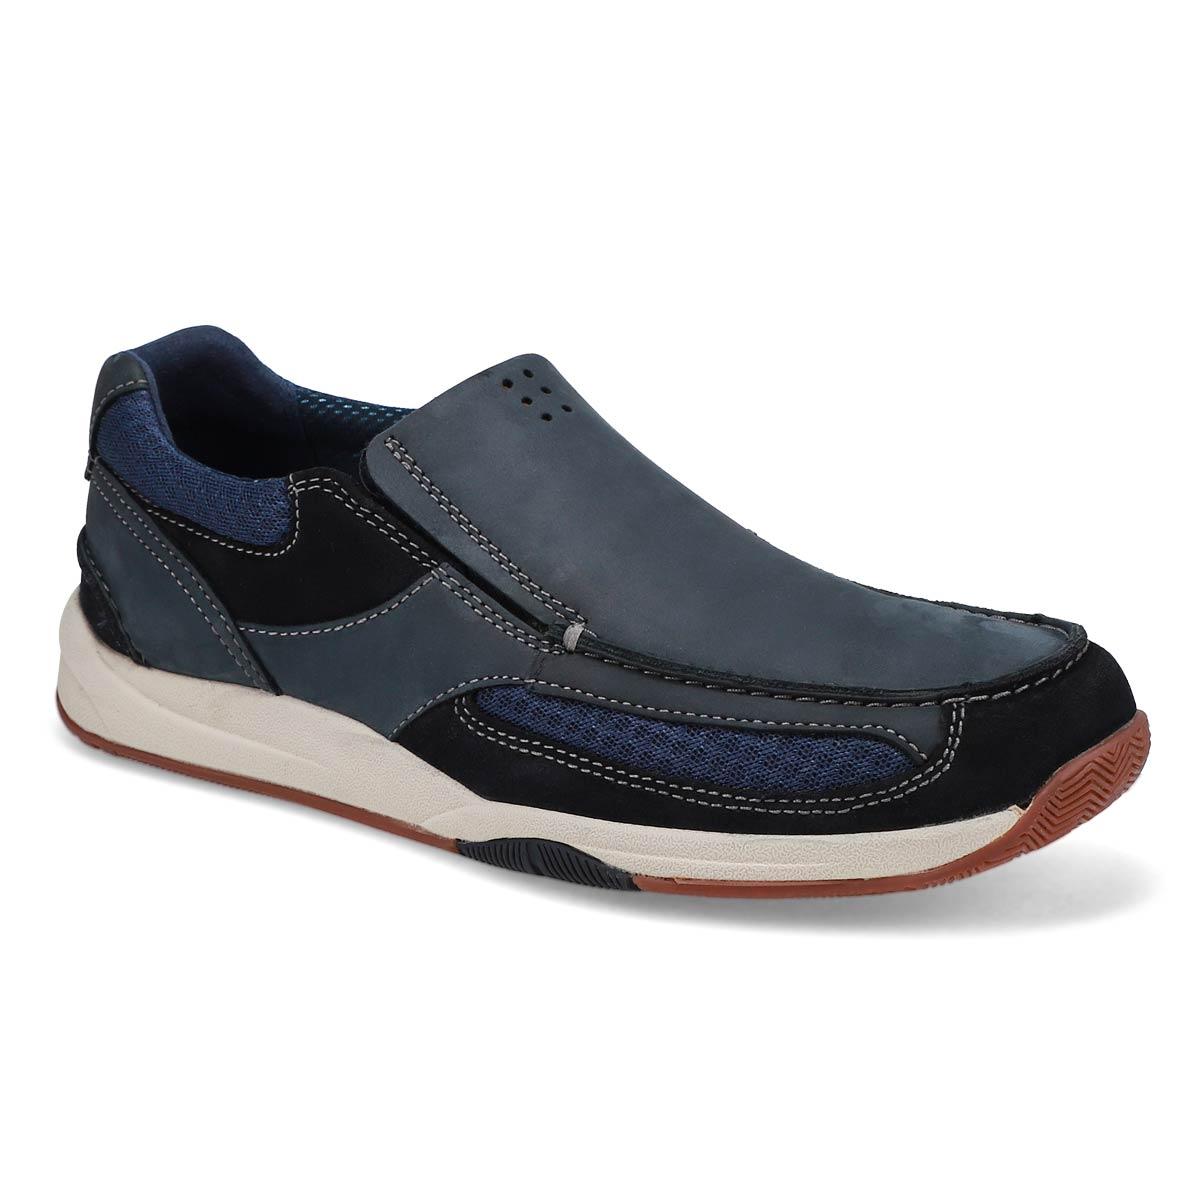 Men's Langton Easy Casual Loafer - Navy